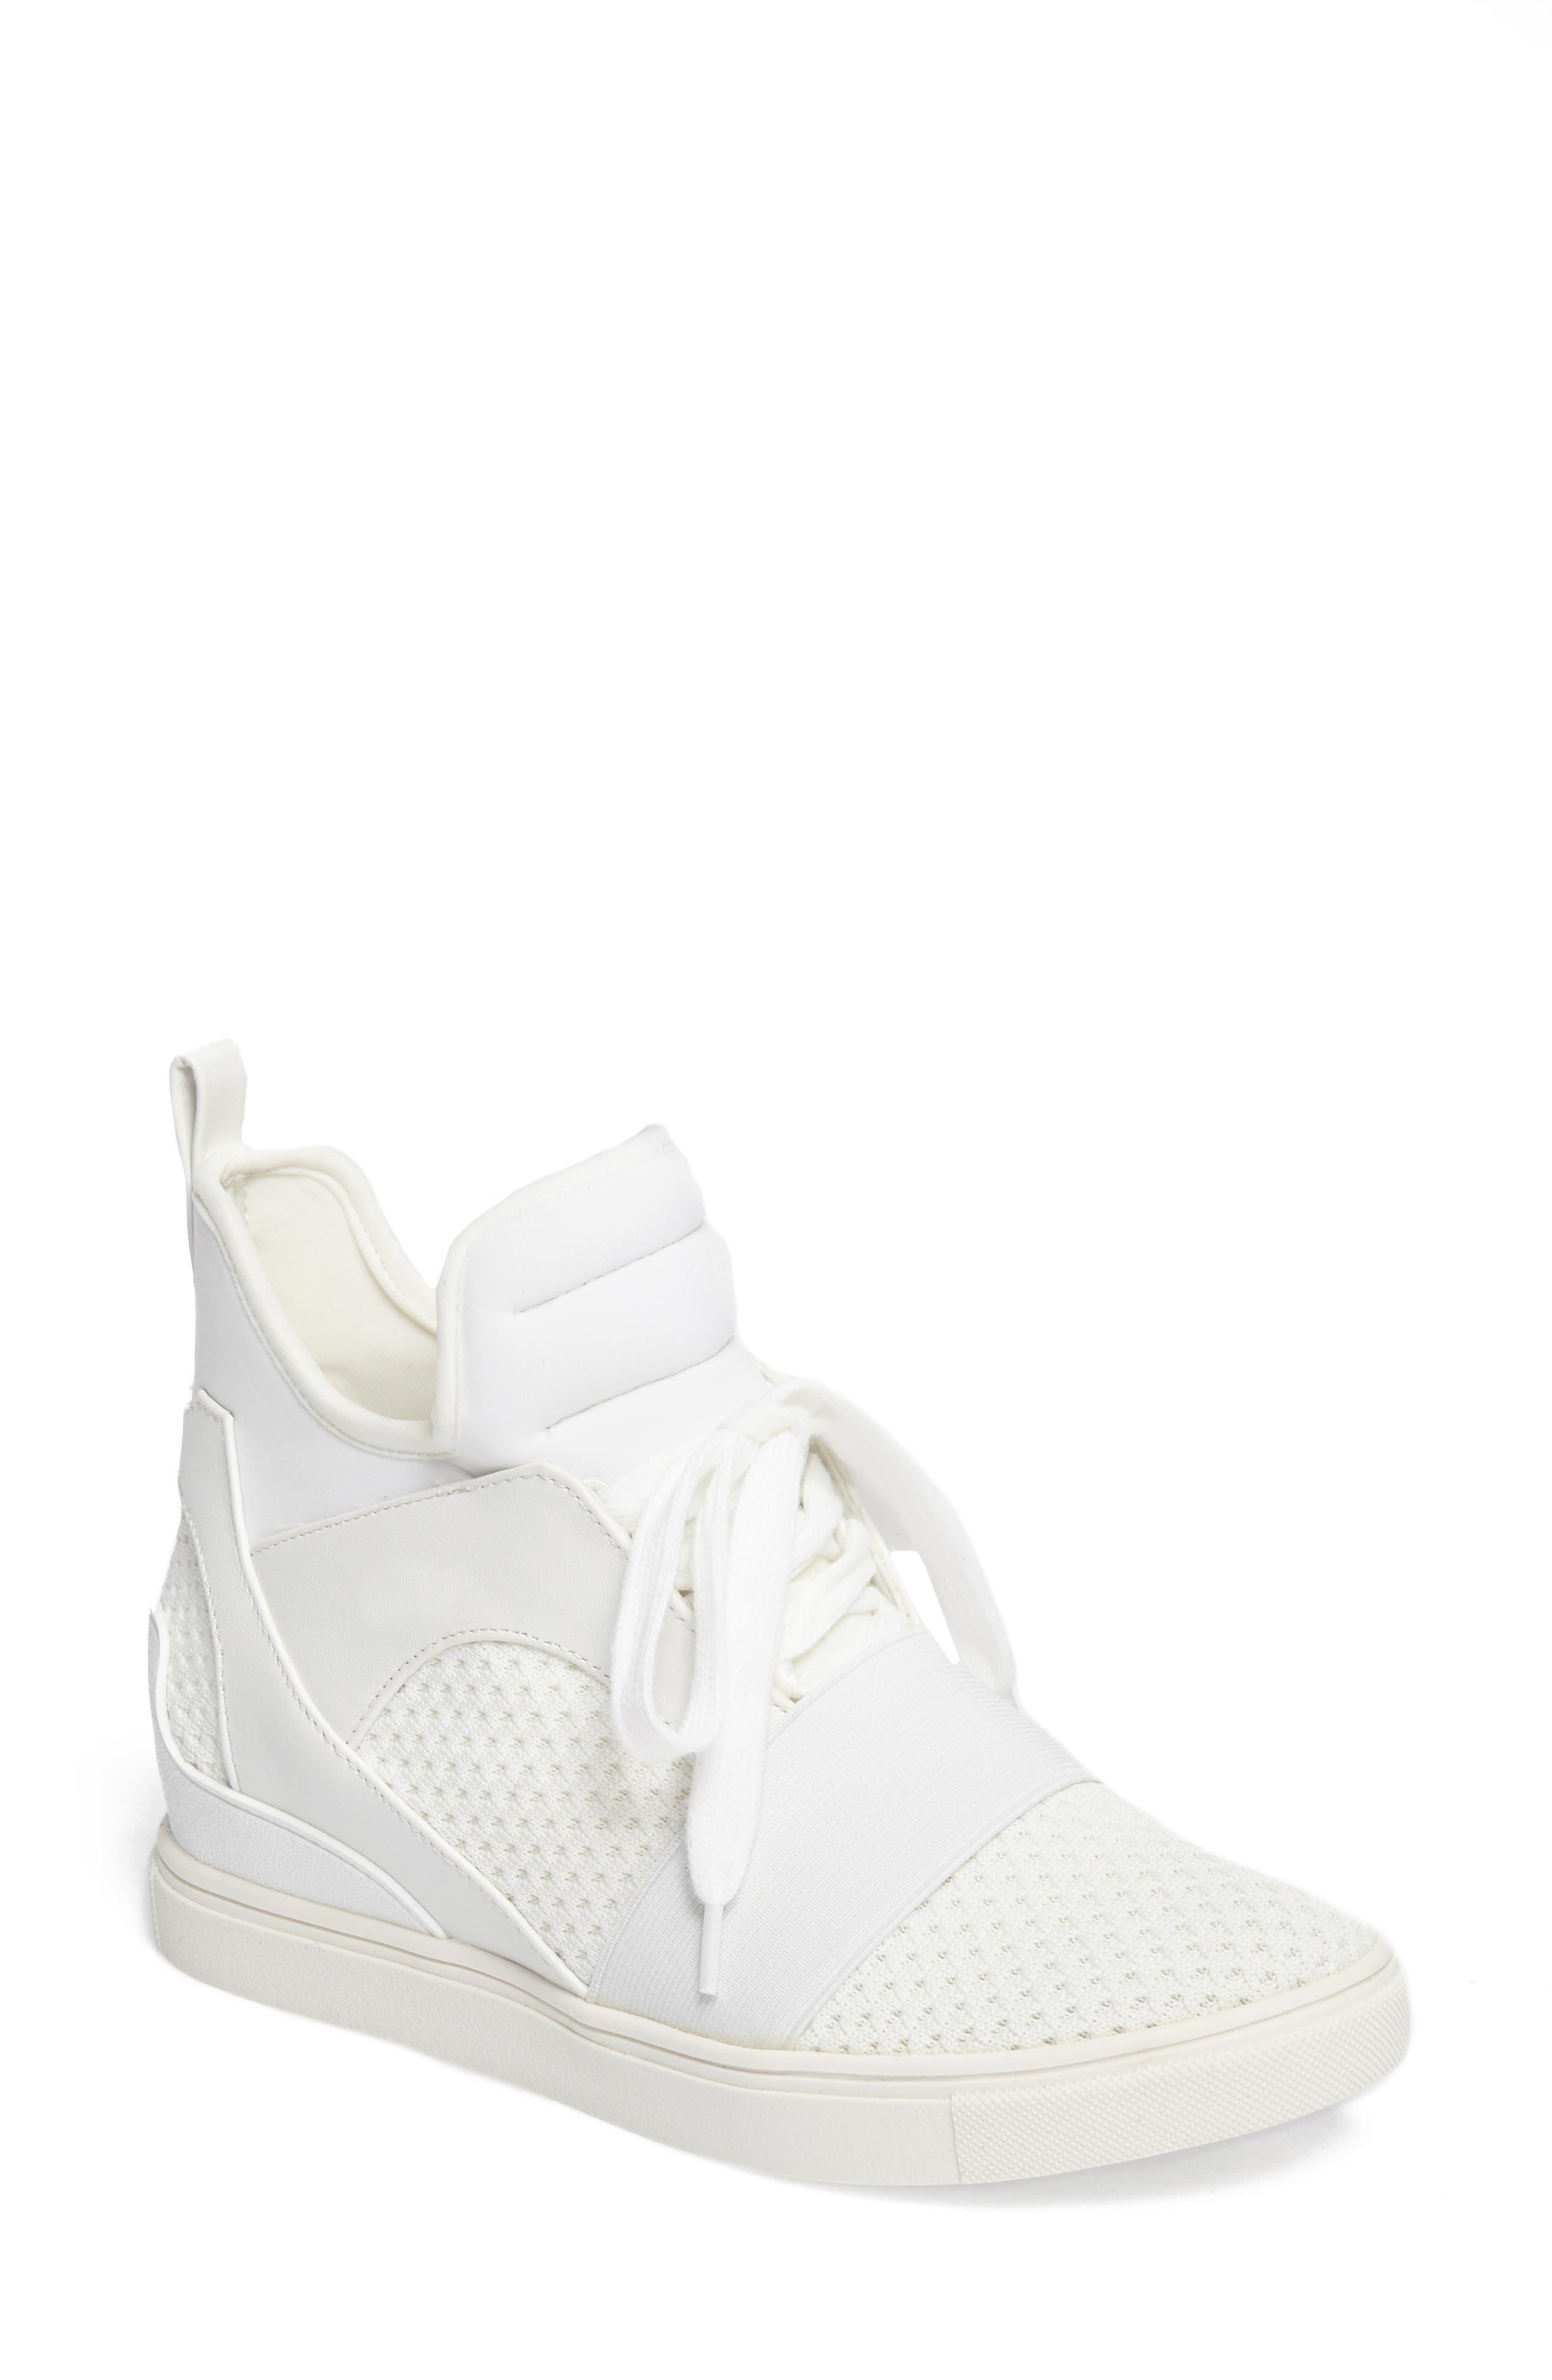 Lexie Wedge Sneaker,                         Main,                         color, White